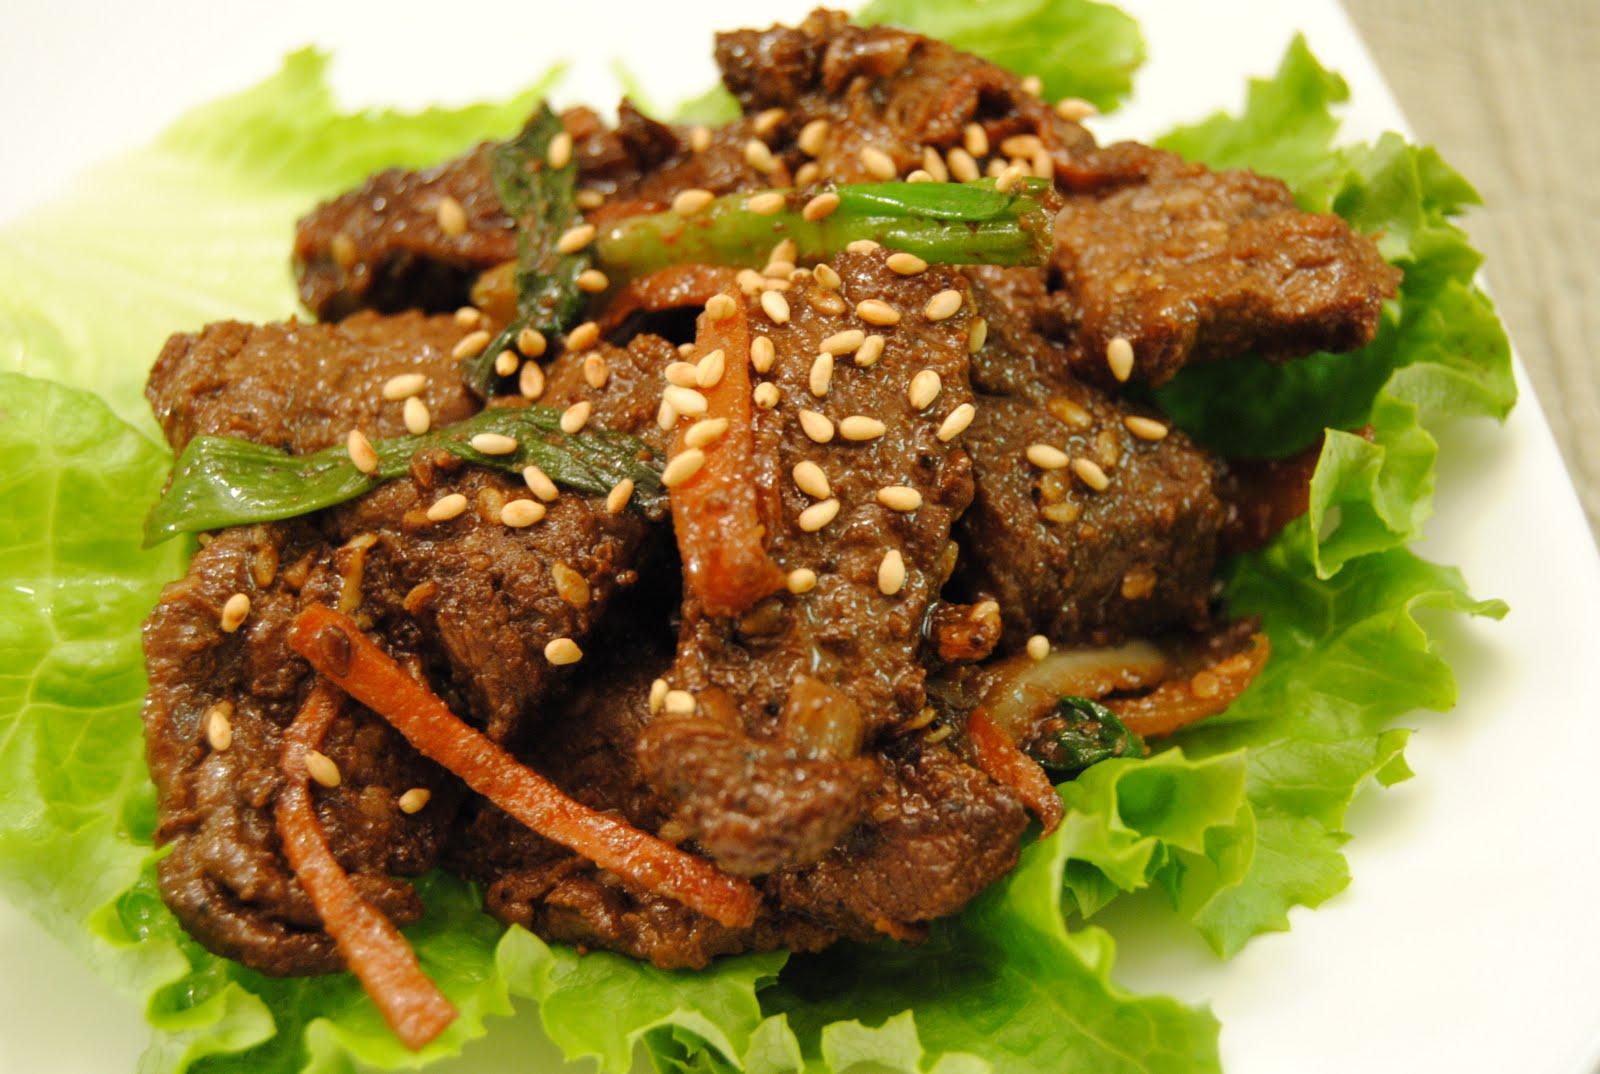 Malikala's Ono Kine Grinds: Korean Bulgogi Beef